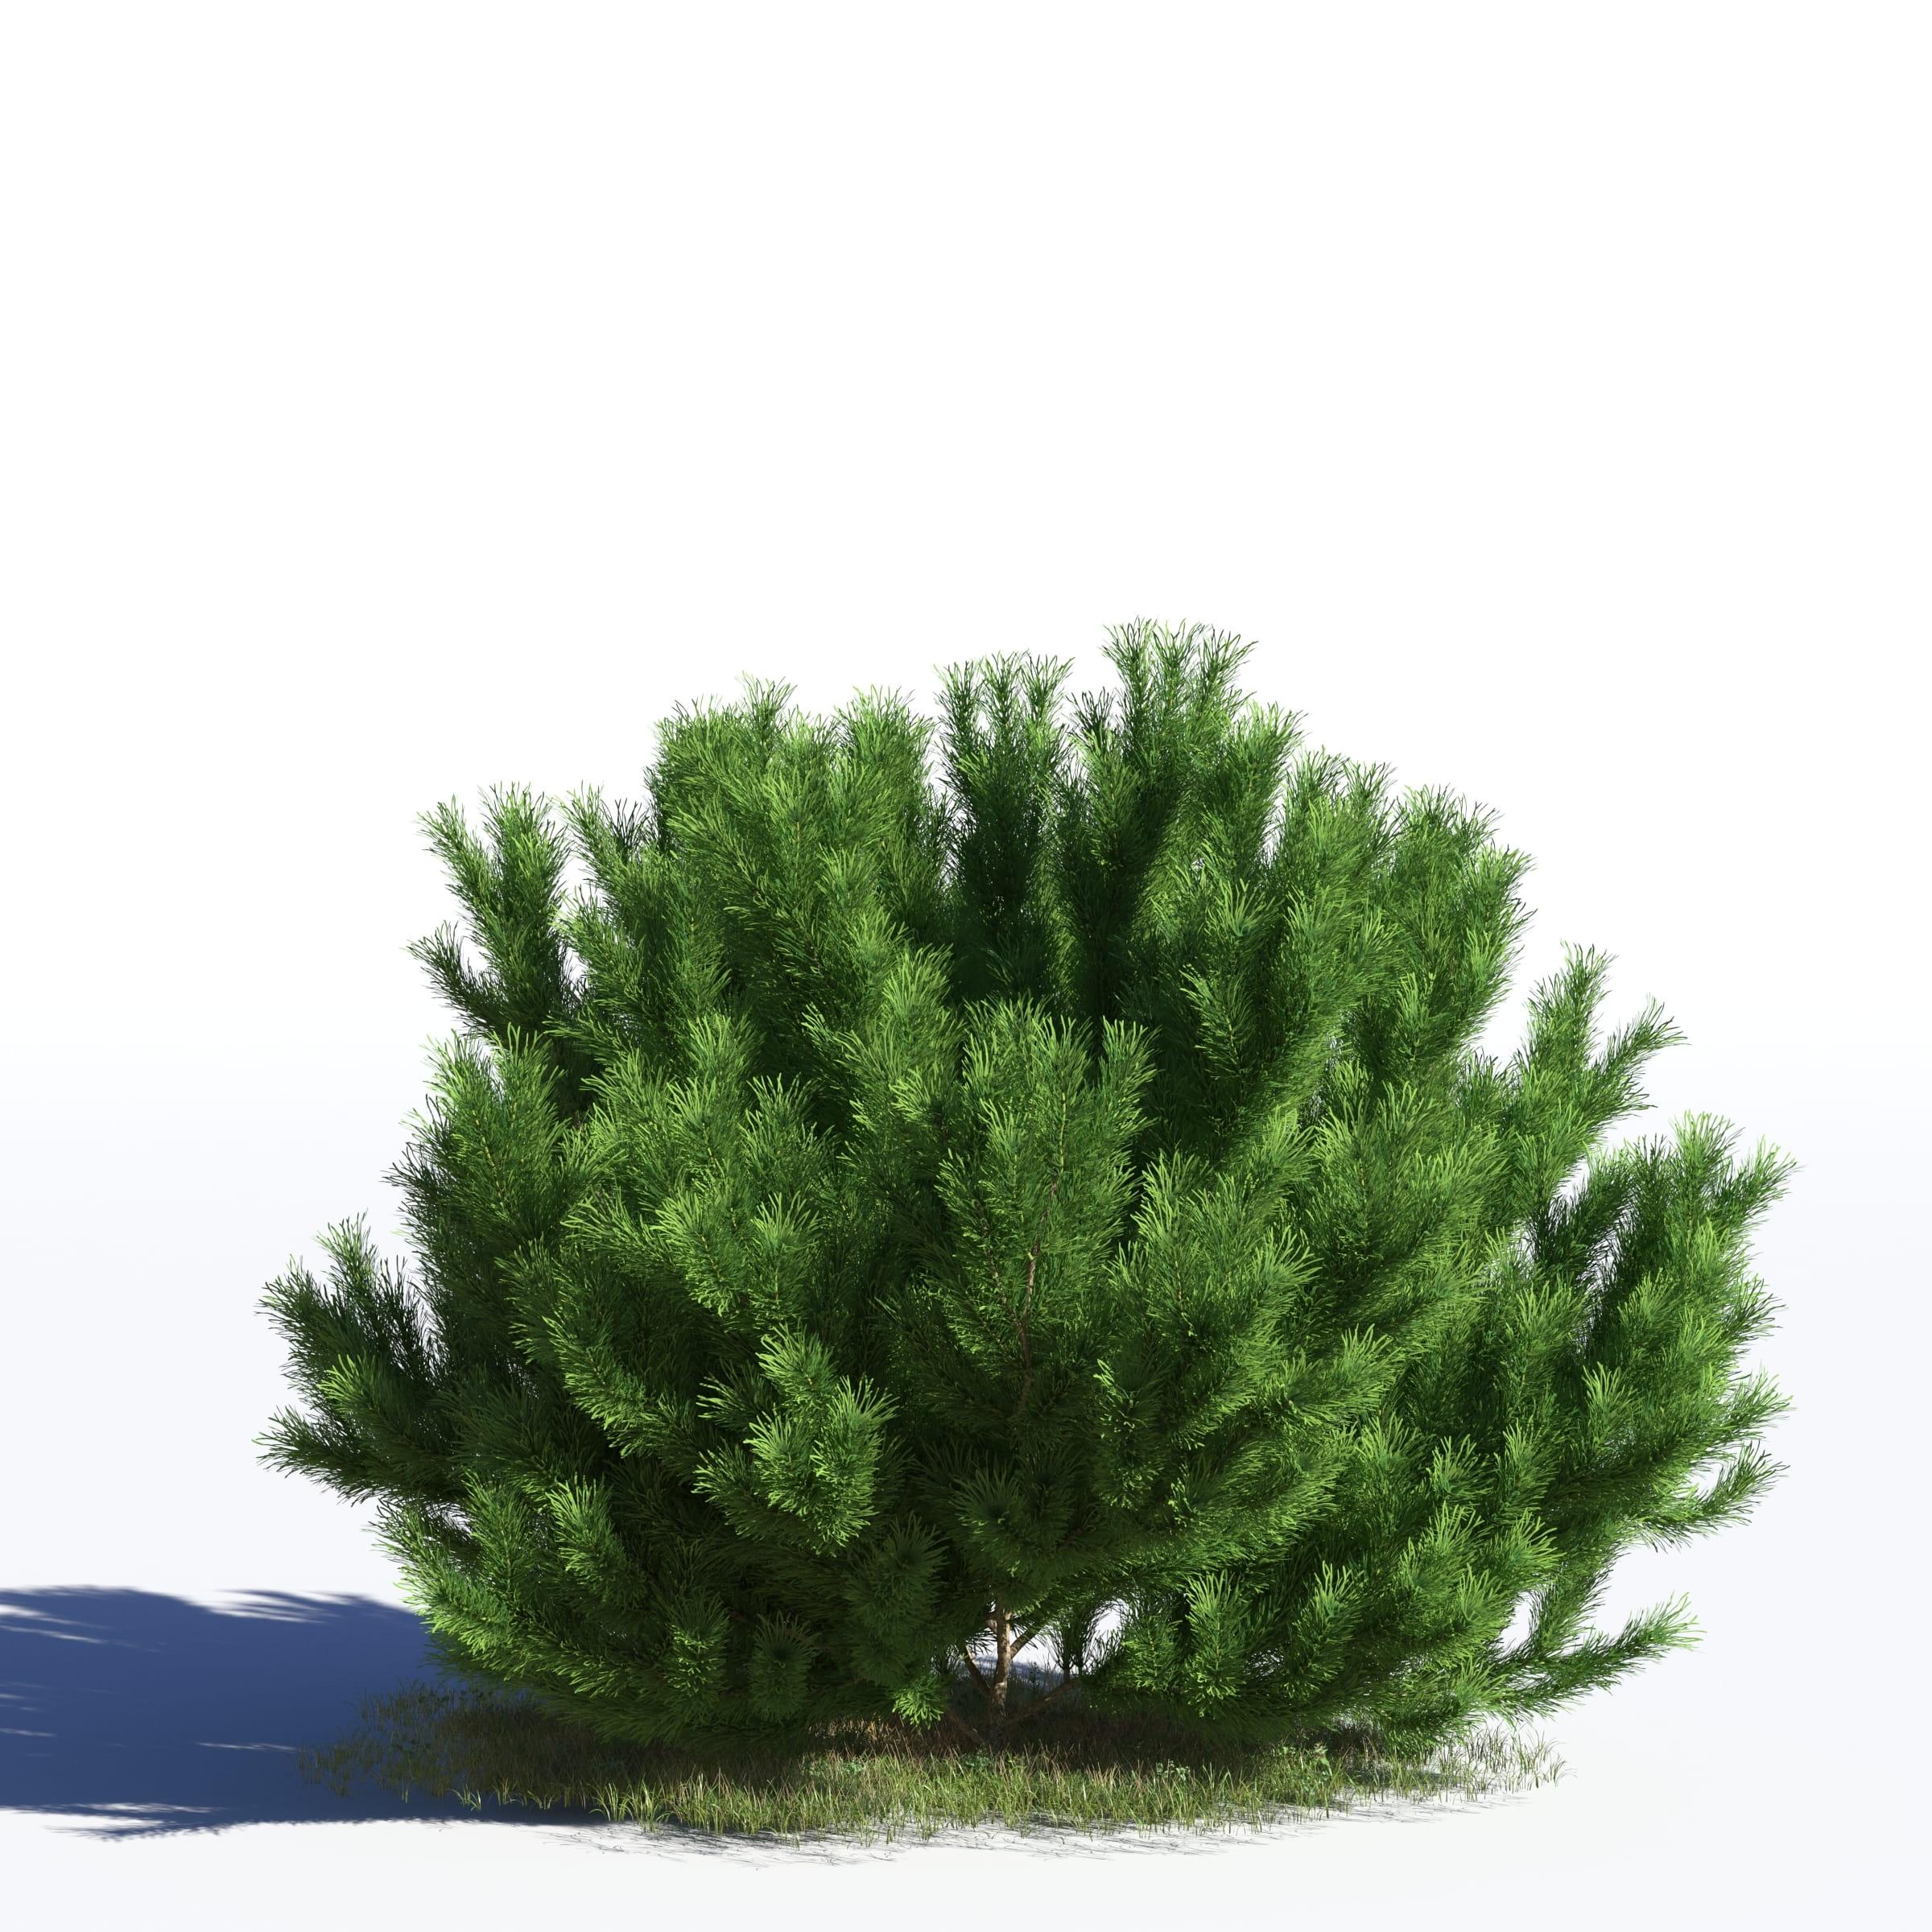 Pinus sylvestris 33 AM219 Archmodels